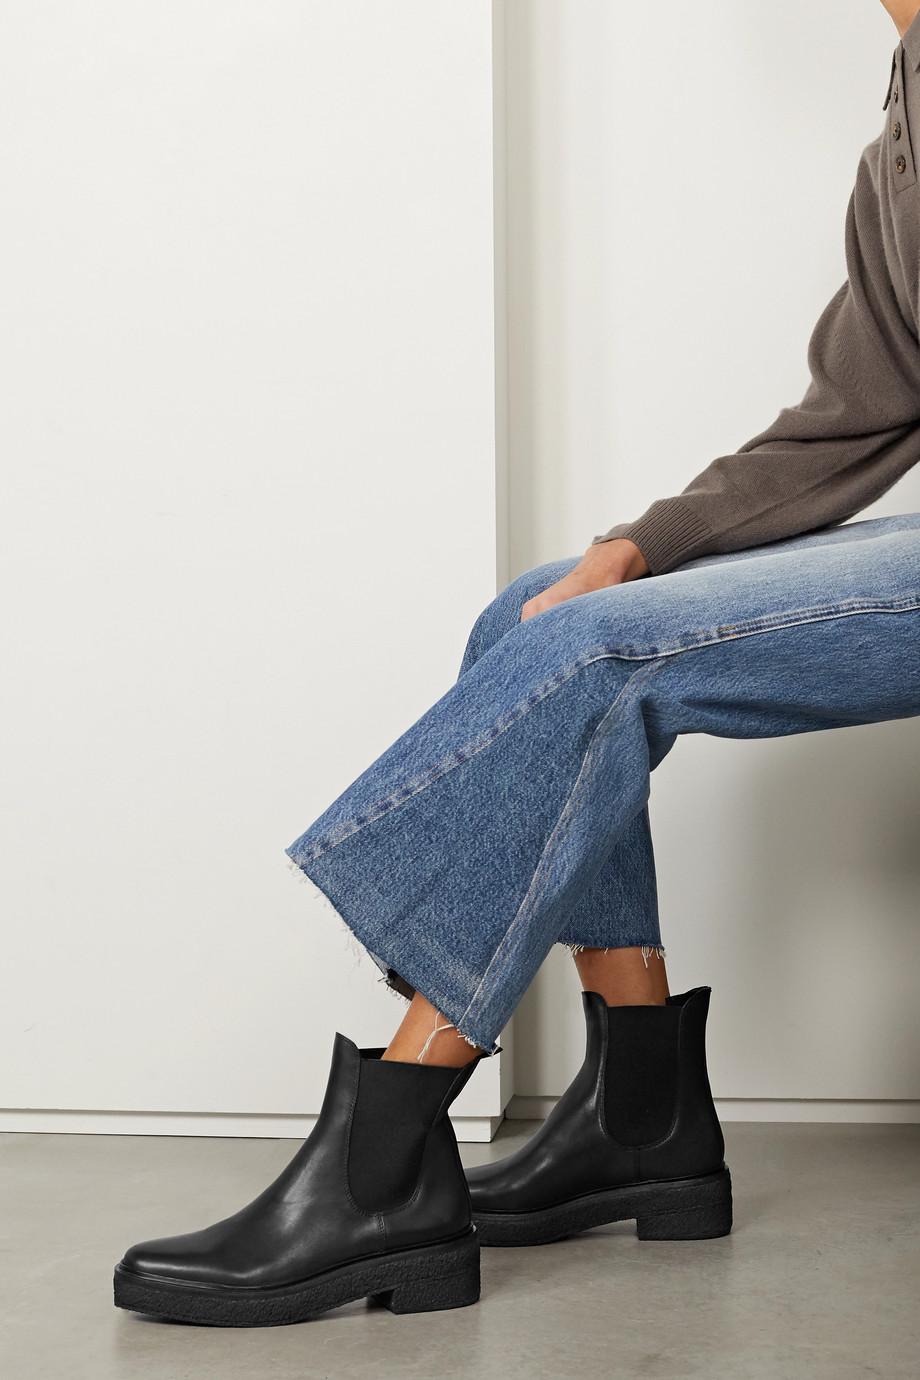 Loeffler Randall + NET SUSTAIN Raquel leather Chelsea boots